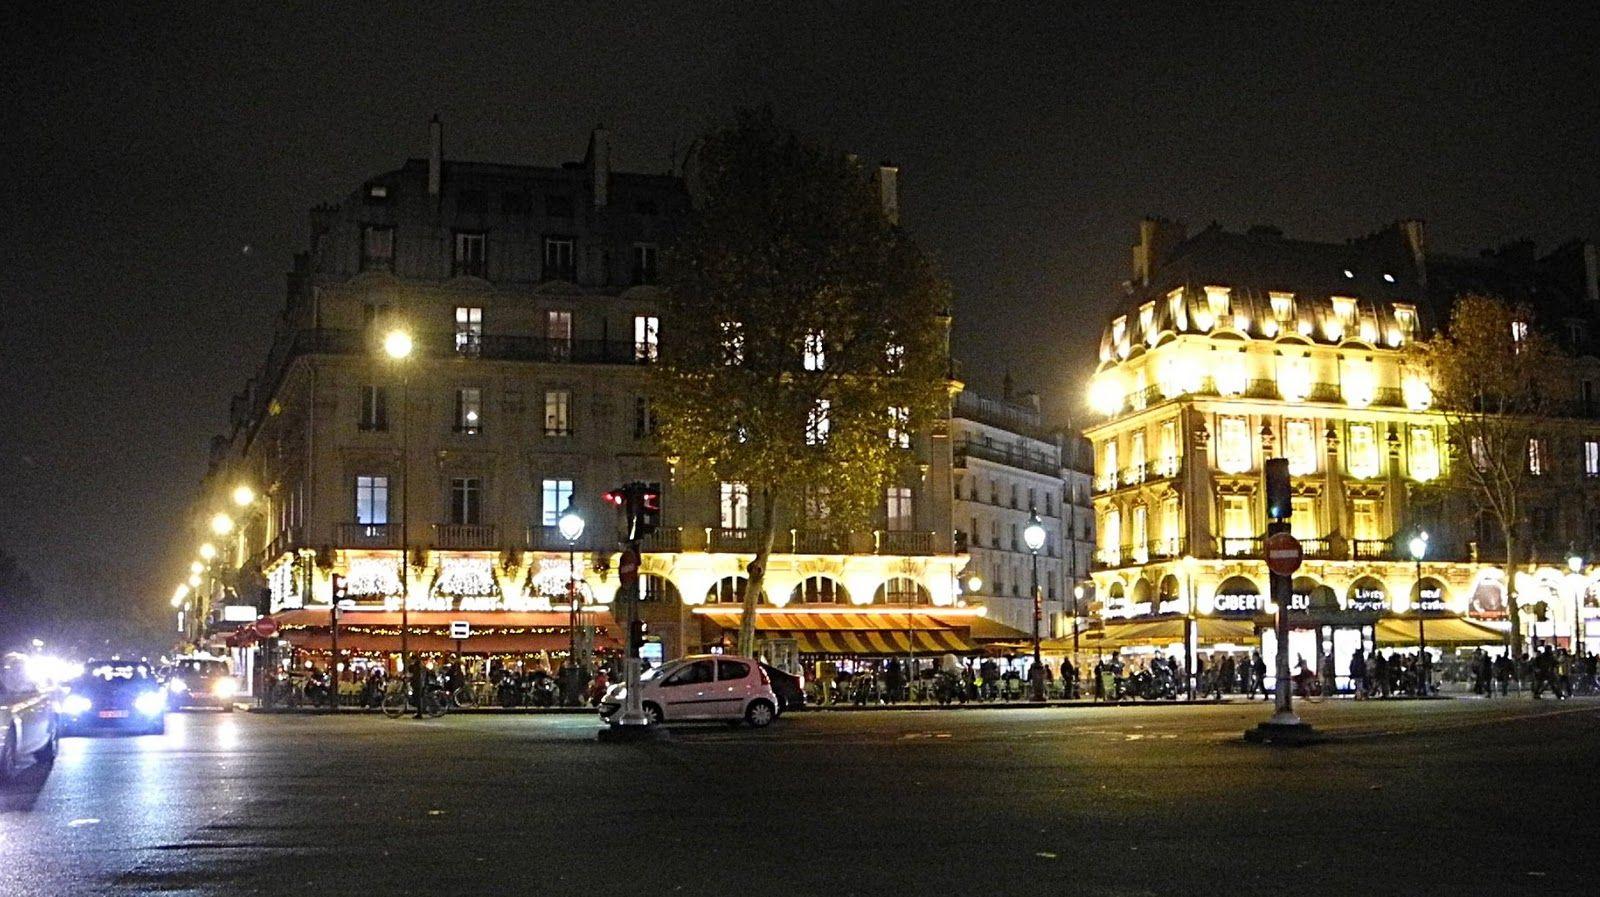 paris at night images | le blog de theoliane: Paris by night